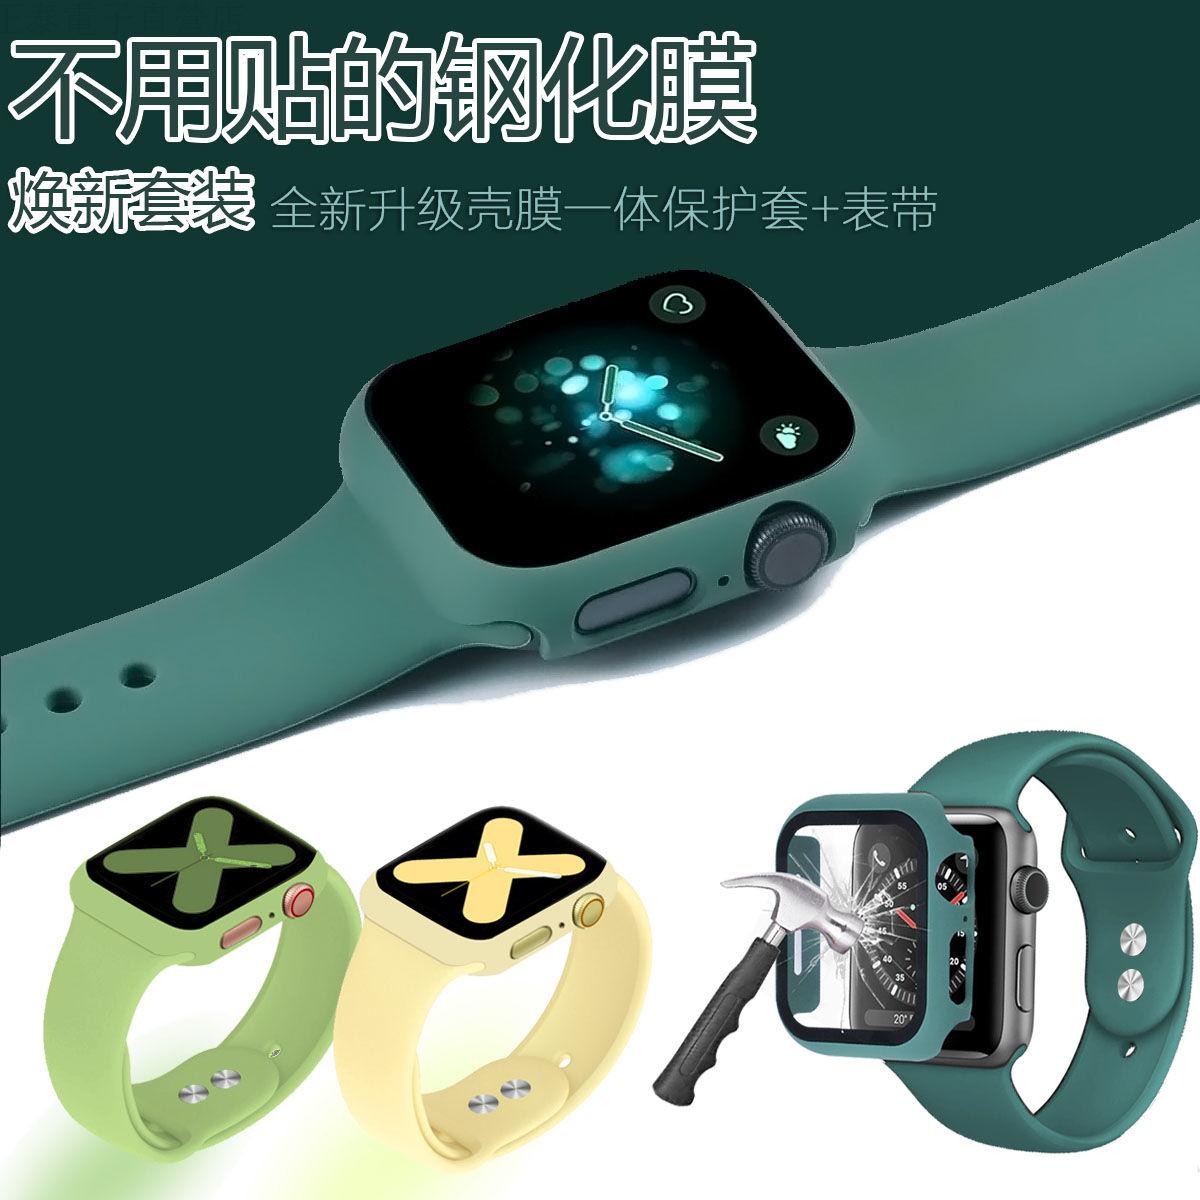 【Apple watch錶帶】蘋果手錶鋼化膜貼膜保護殼噴油PC硬360度全包apple watch錶帶套裝